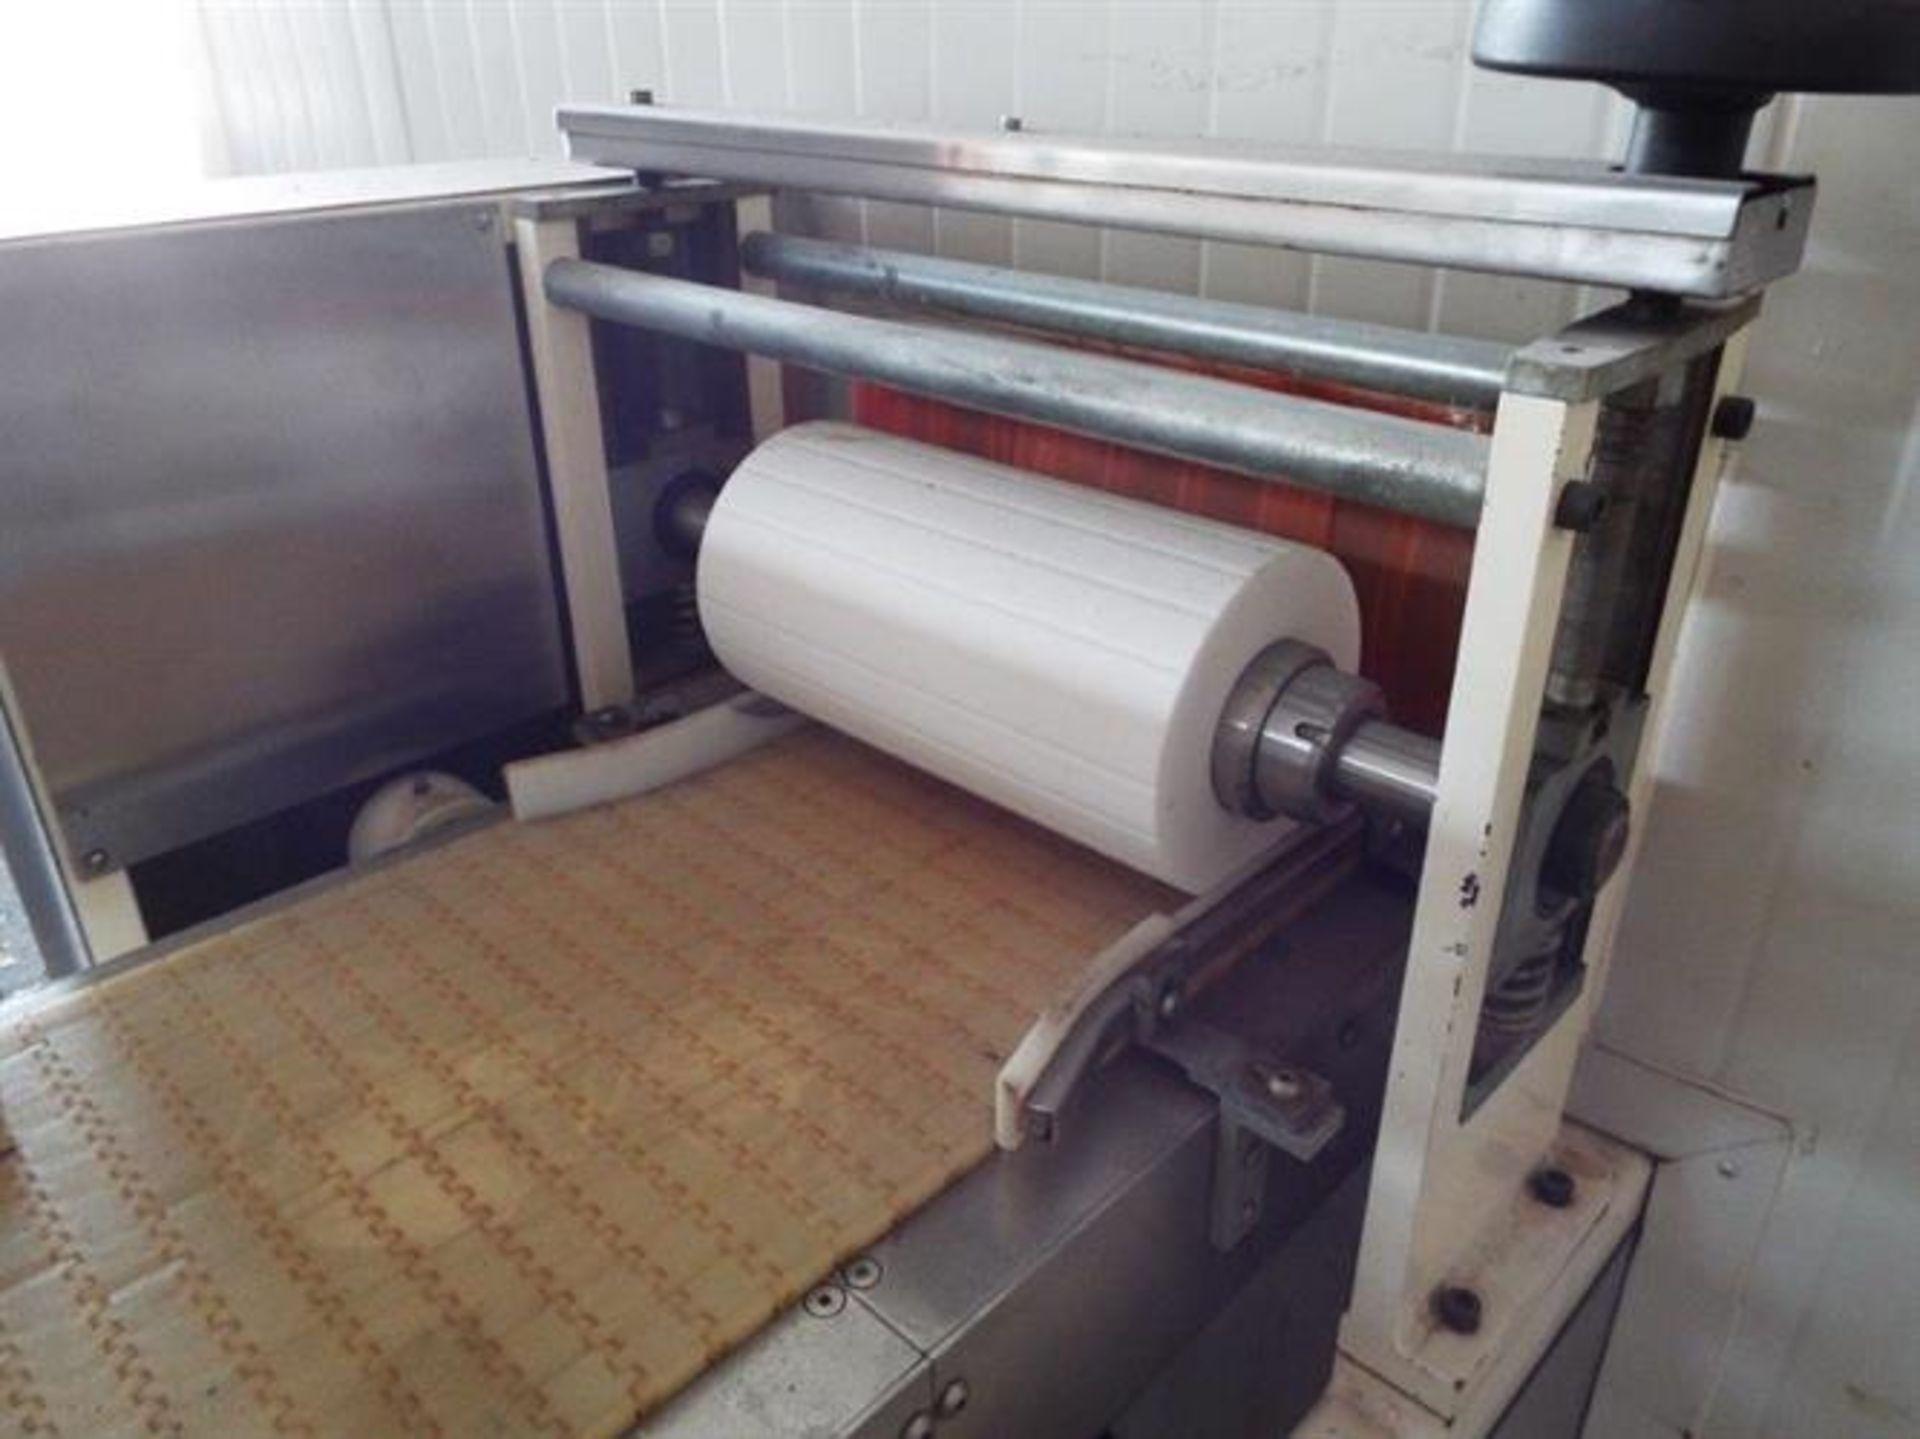 Tecmaq 290 mm Wide Slab Forming Line - Model TM-6H built 2012 - Three sets of gauging/sheeting - Image 15 of 30